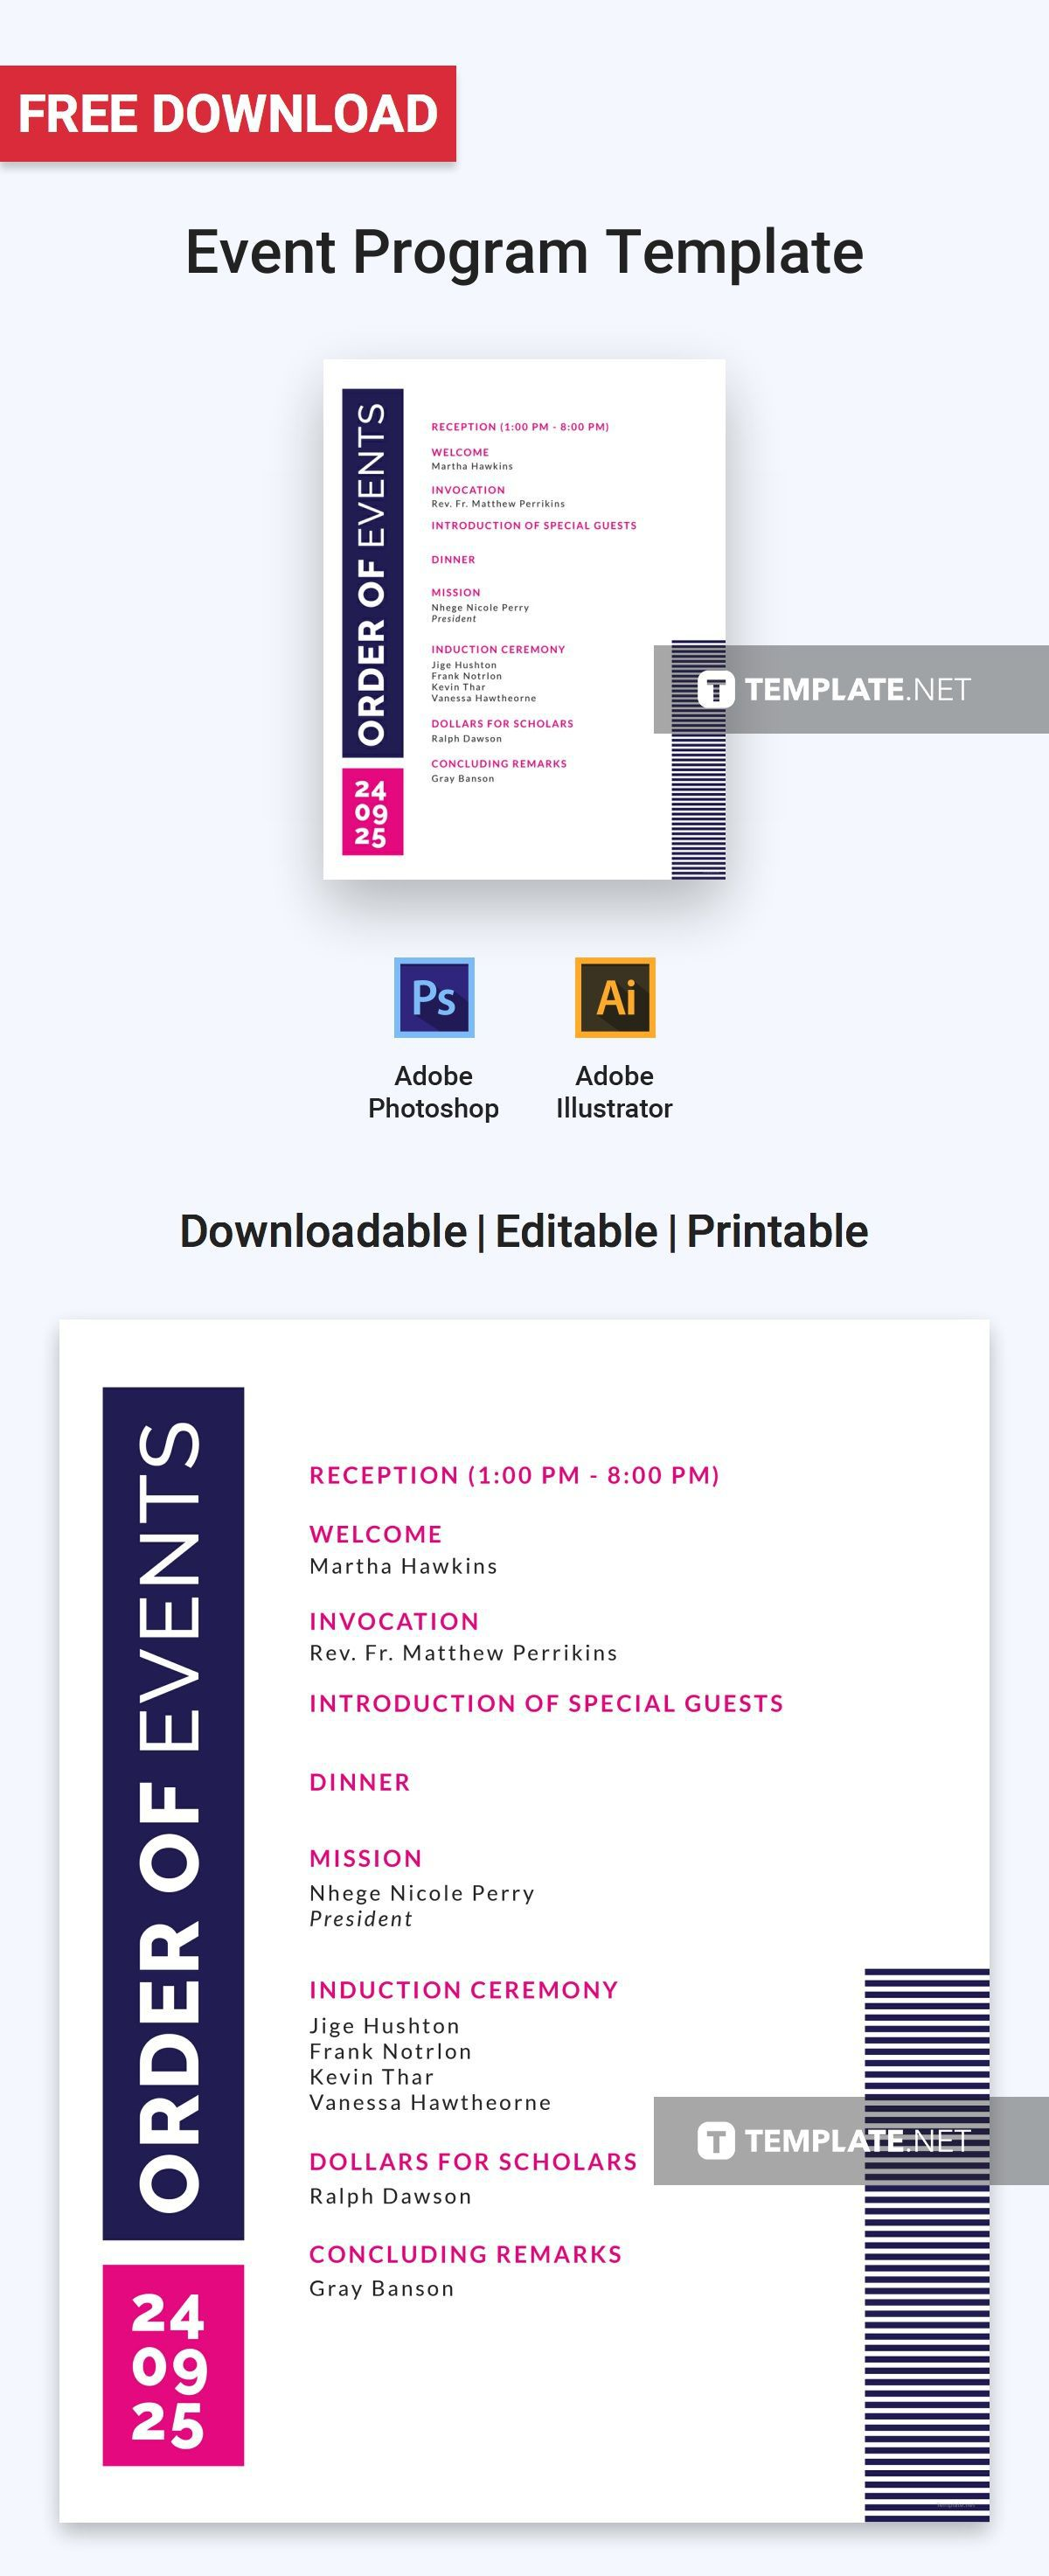 004 Simple Free Event Program Template Concept  Templates Half Fold Online DownloadFull